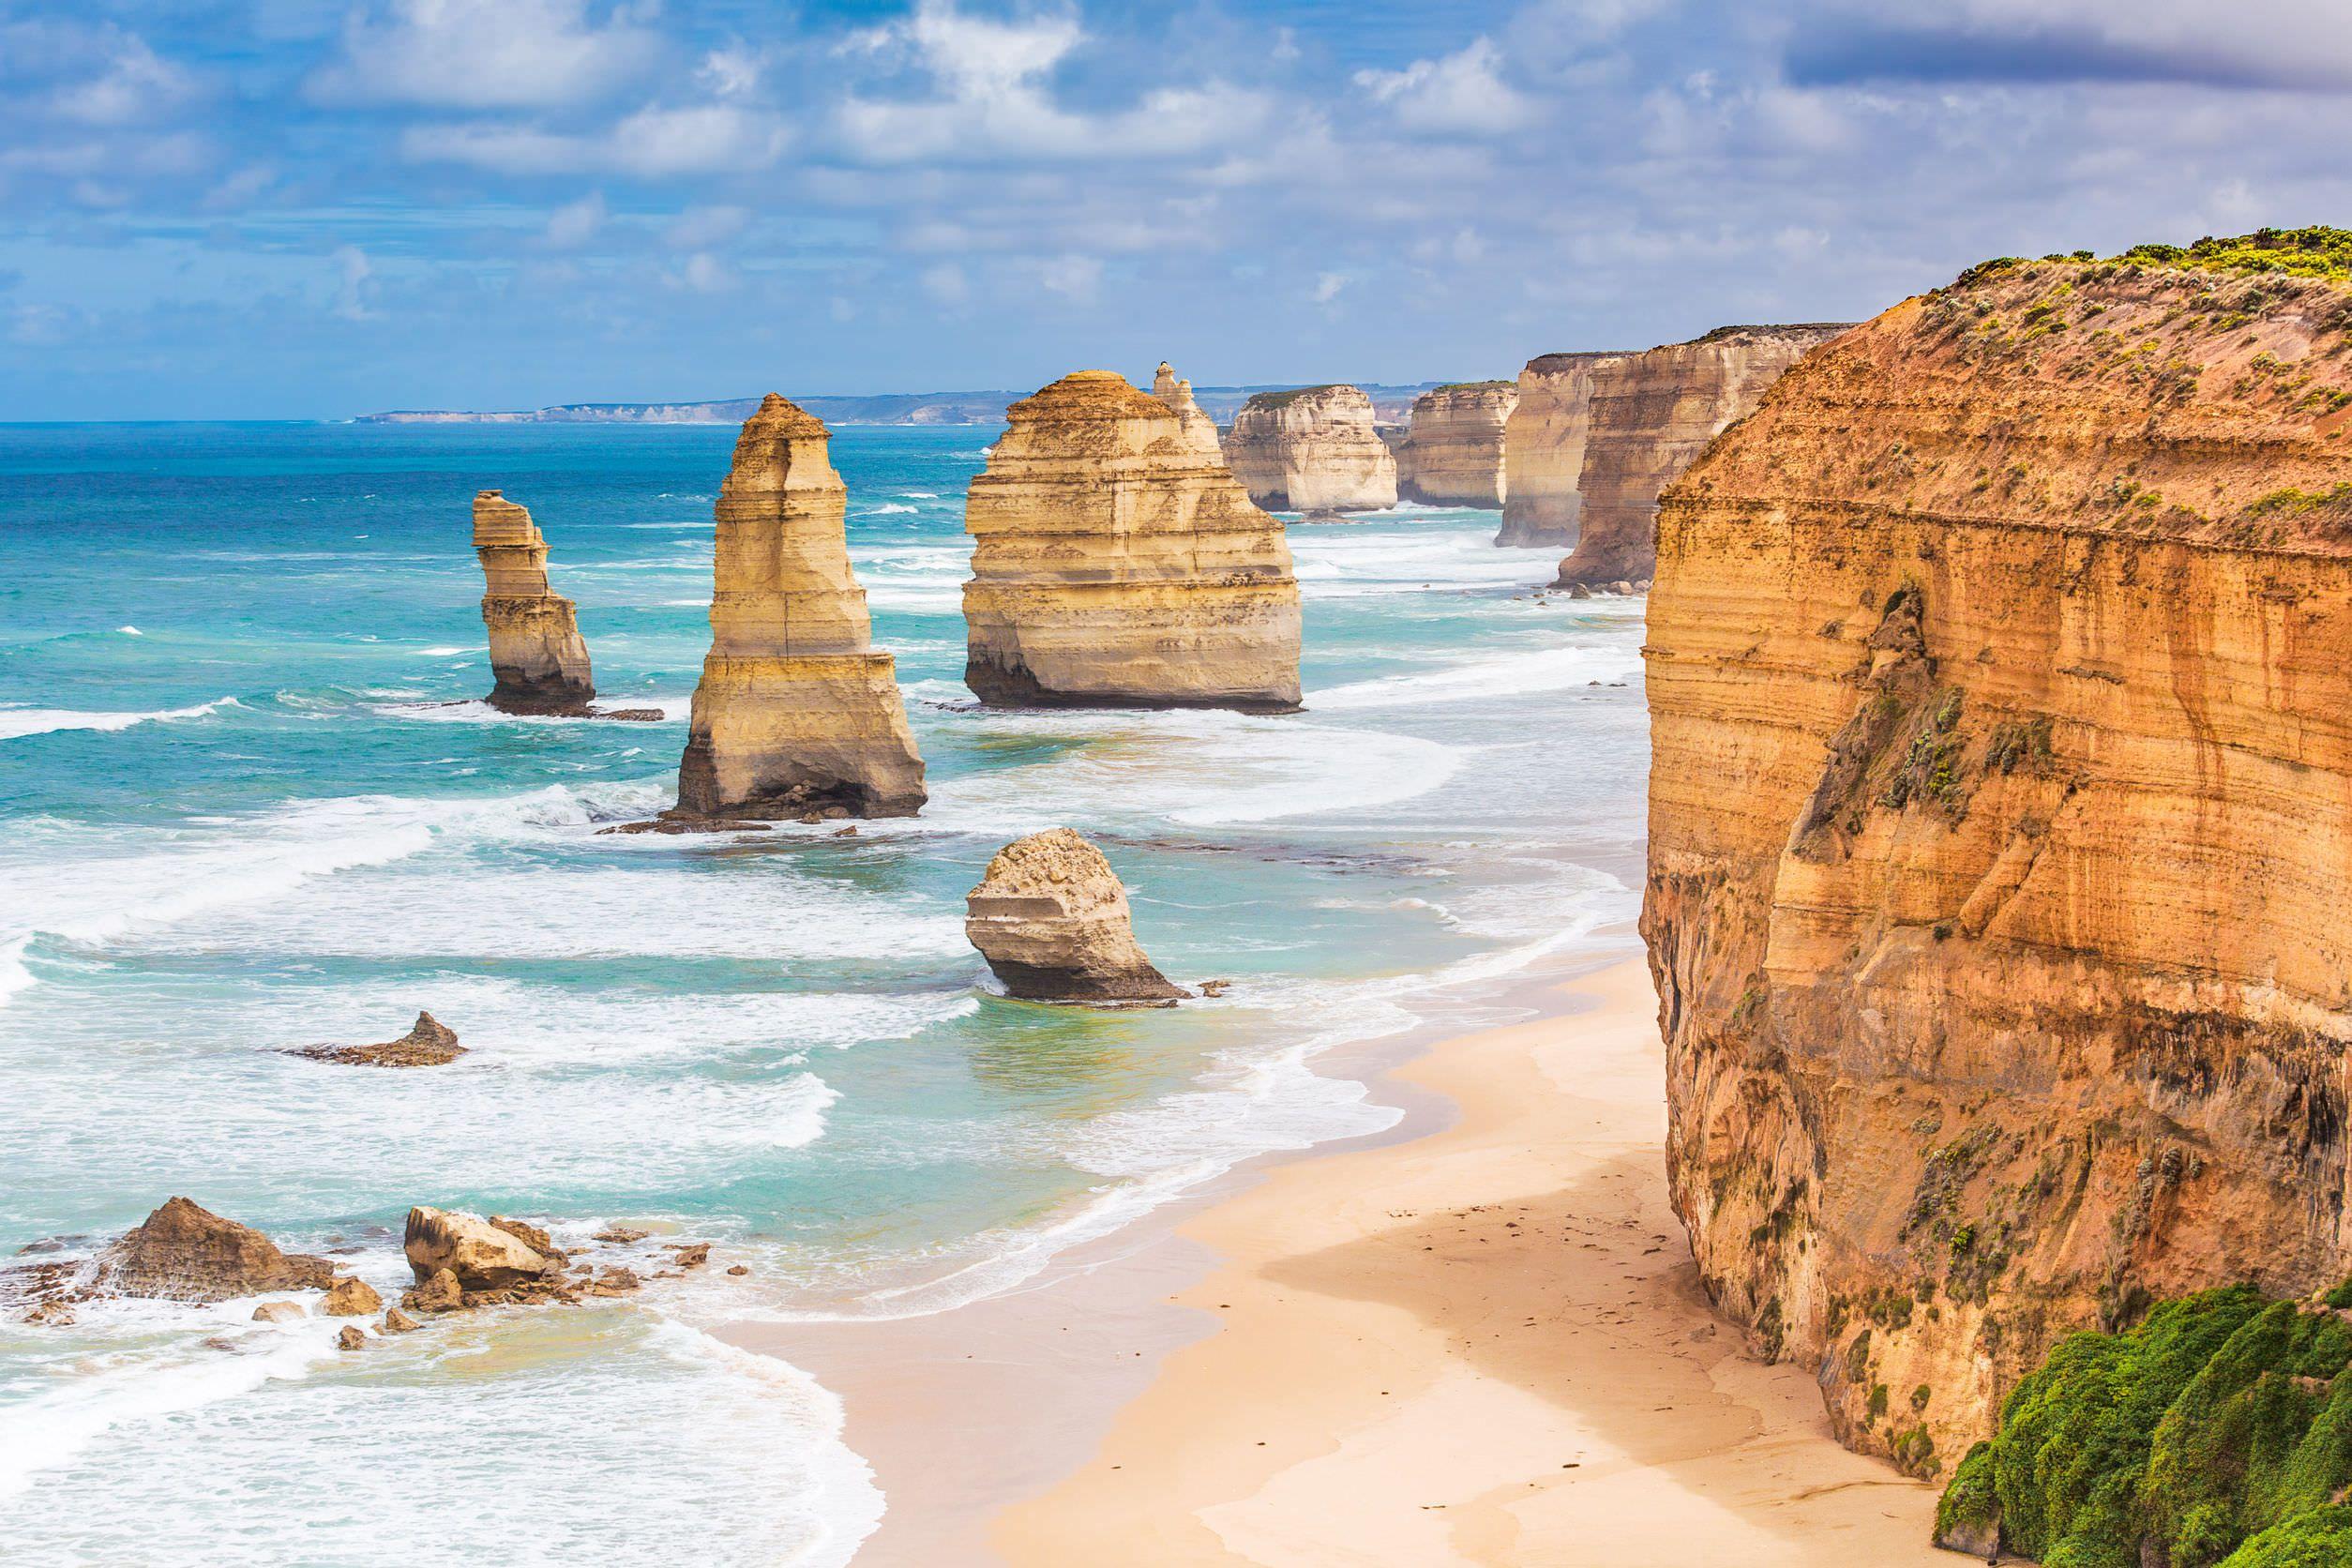 , Australian state to investigate legalizing recreational cannabis